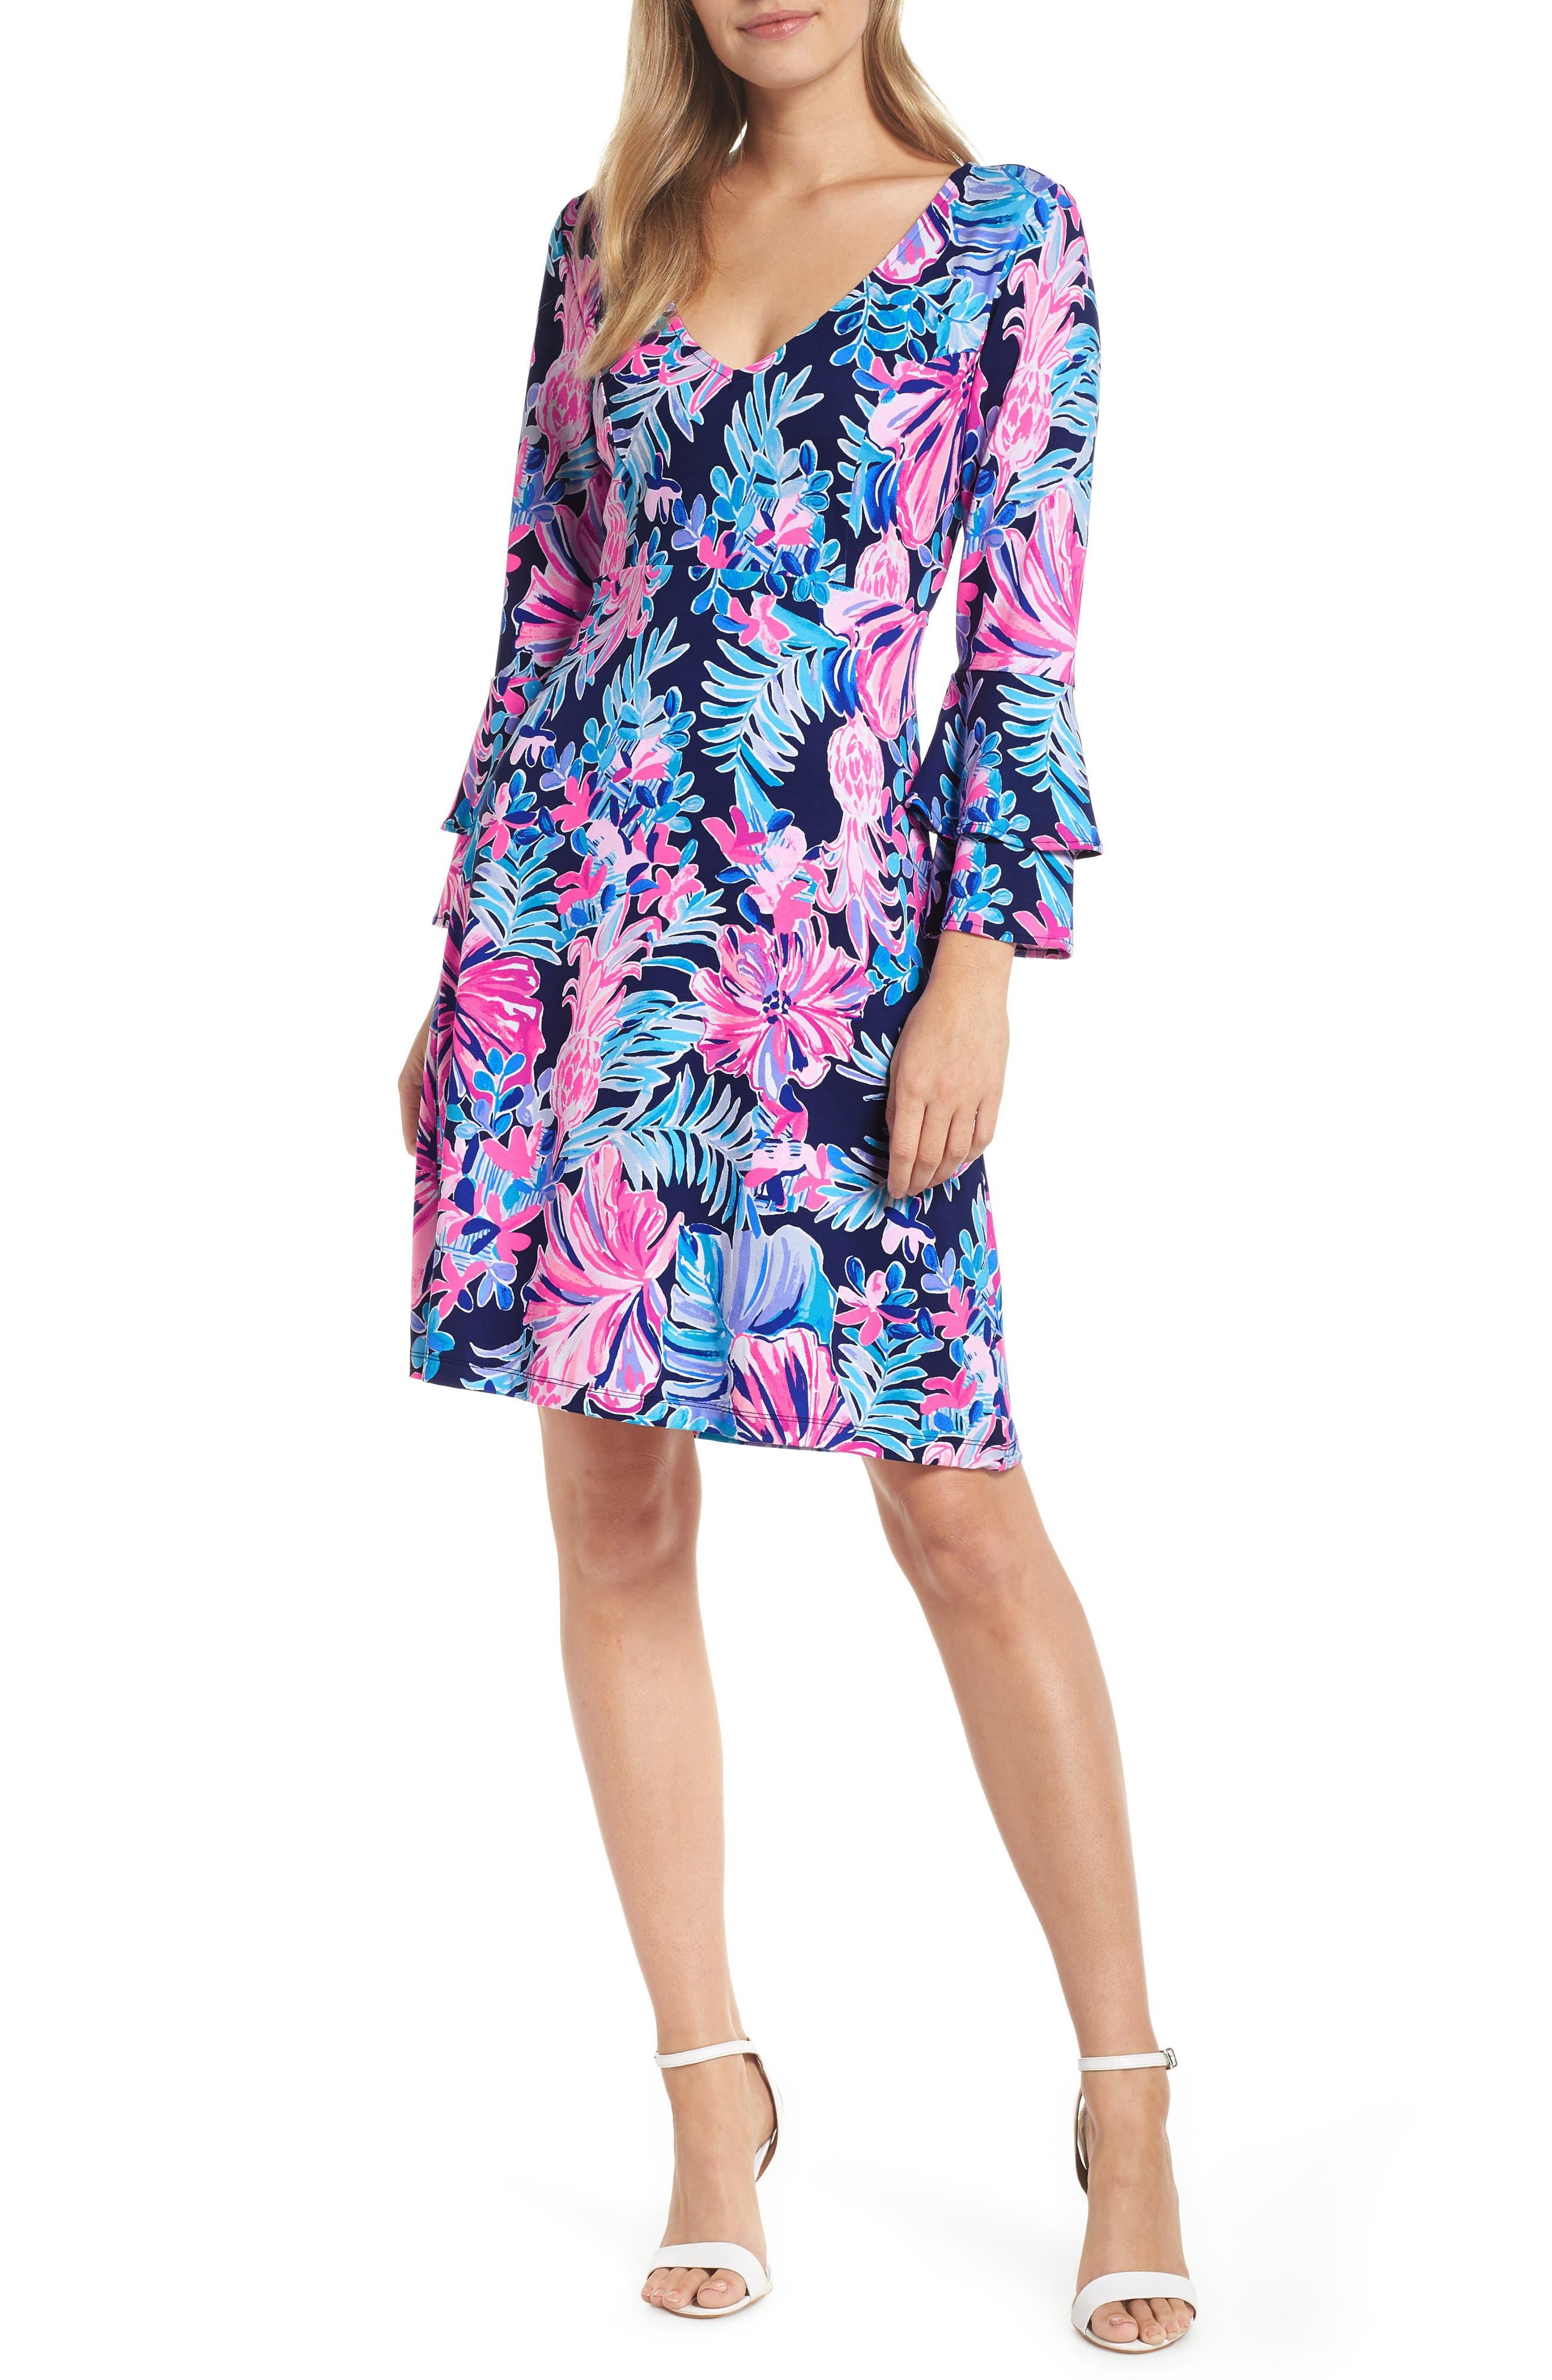 Lilly Pulitzer Raina Fit & Flare Dress